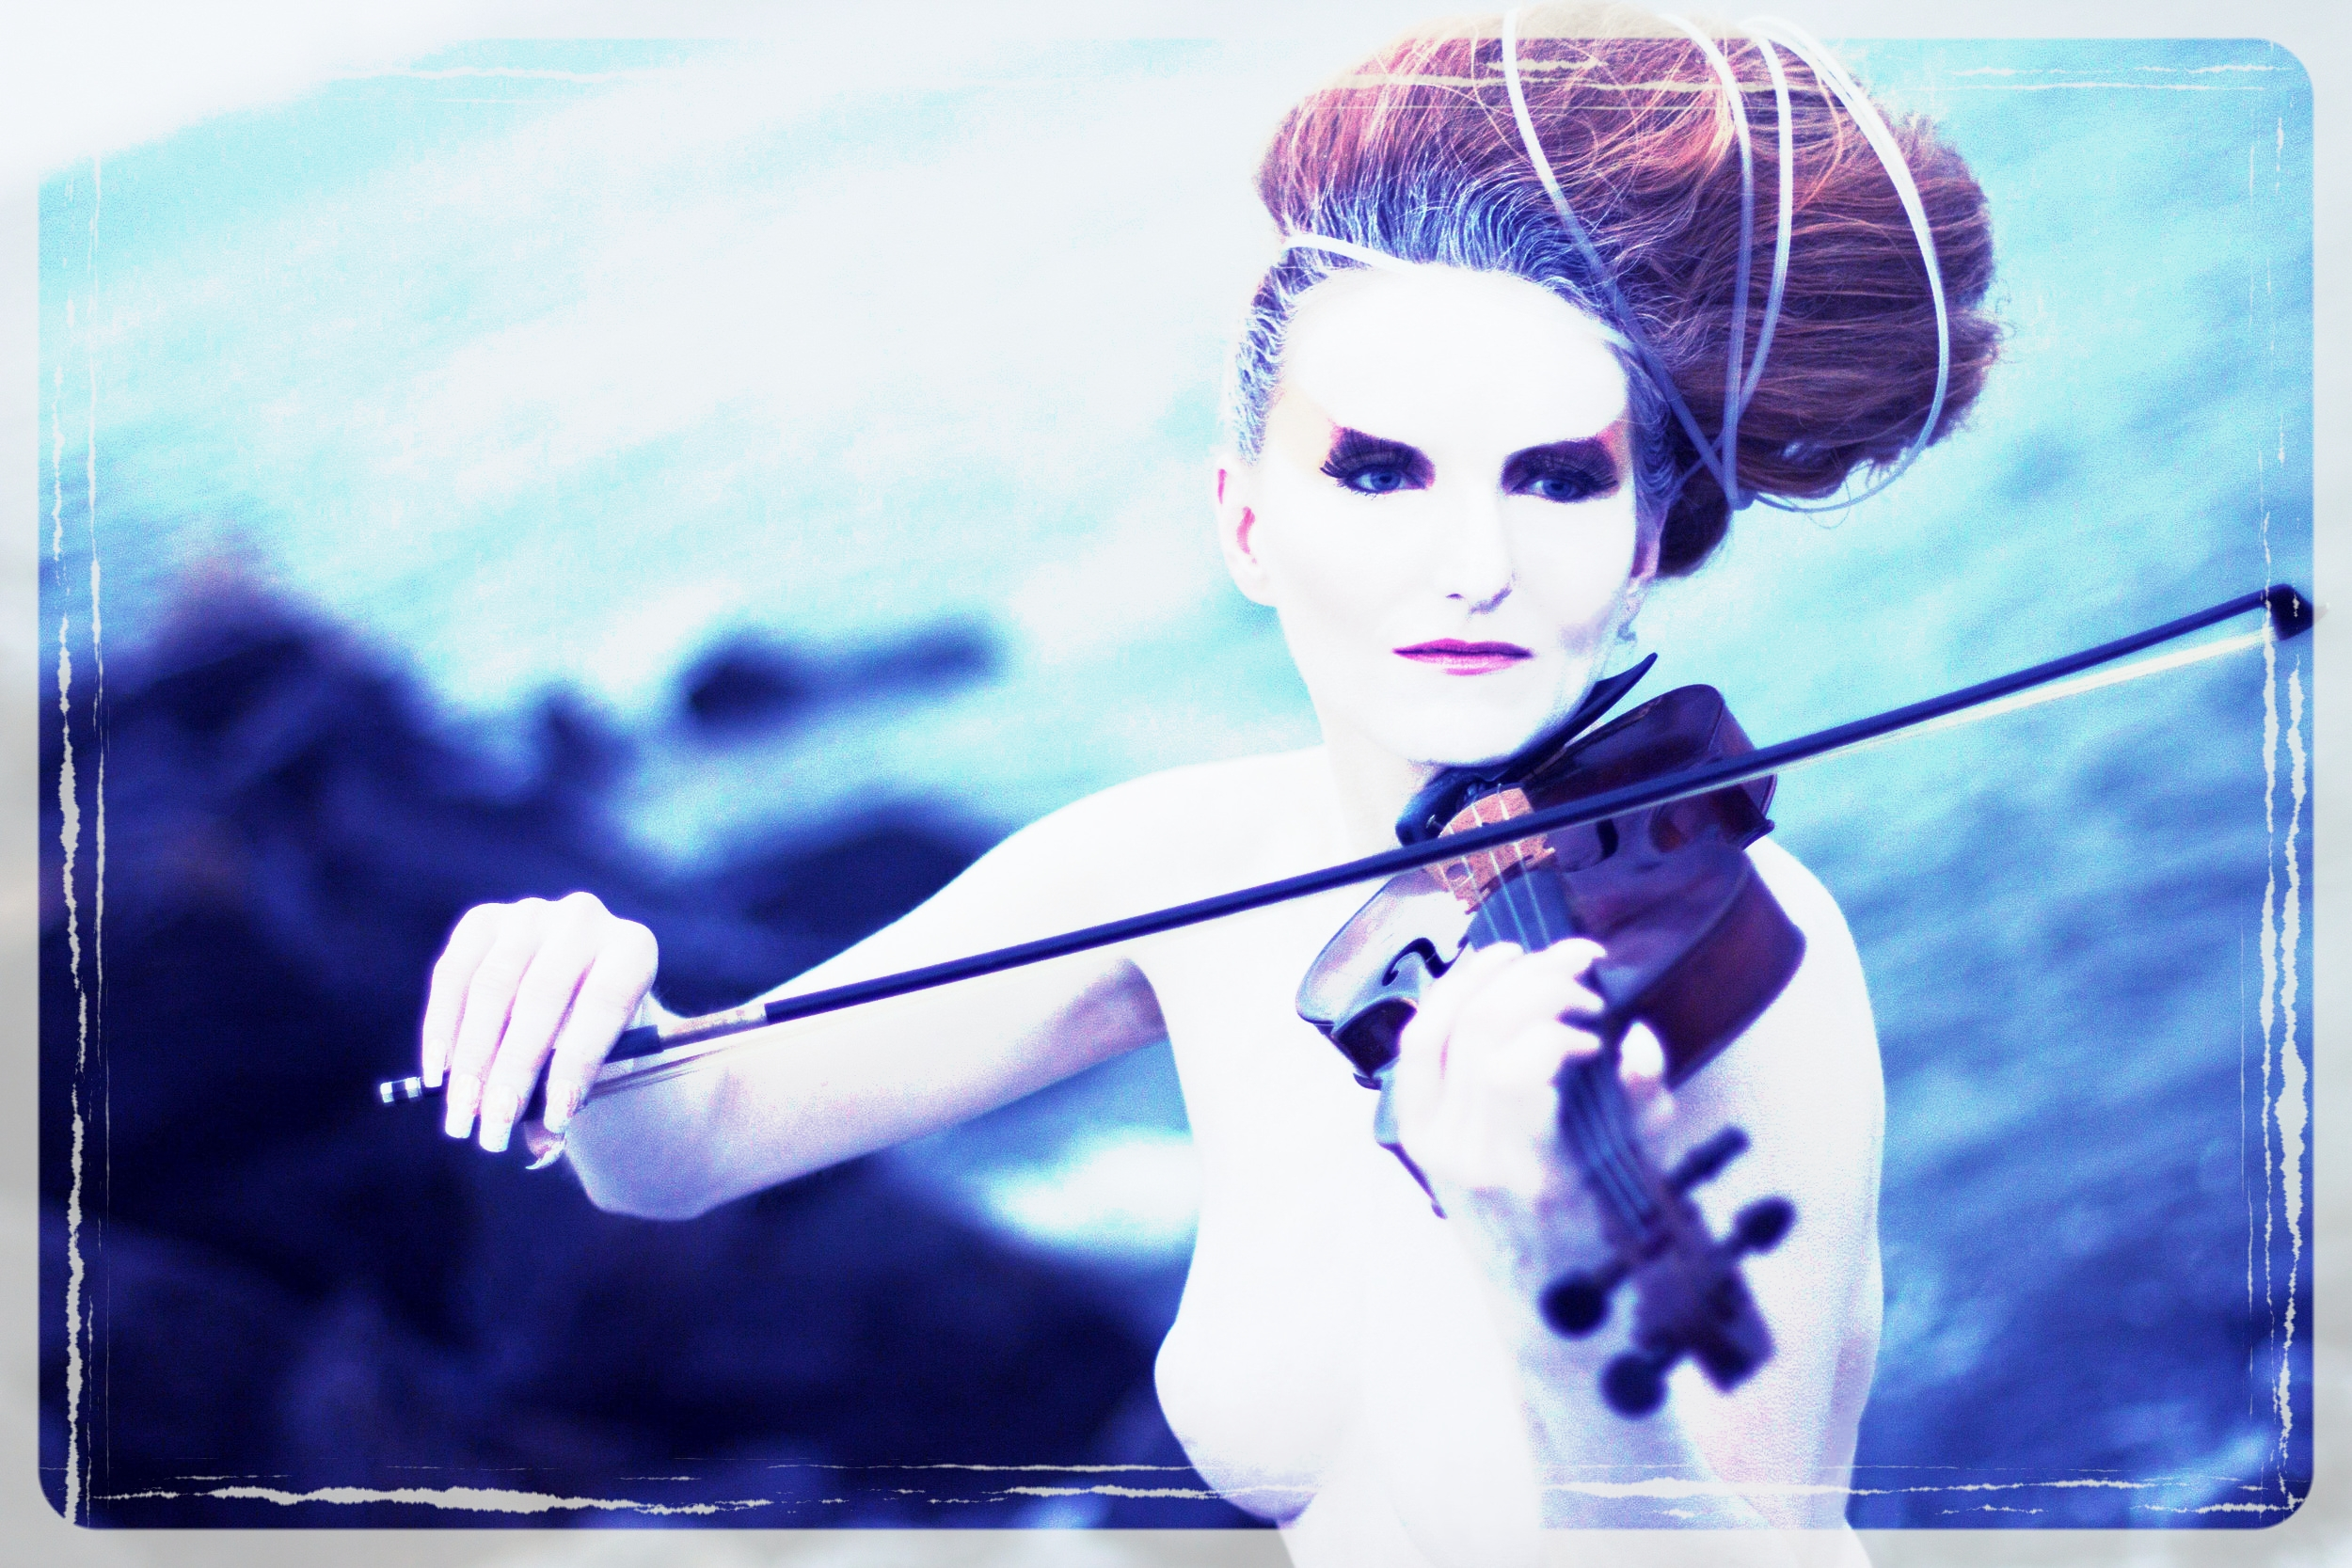 Violinist_Singer_Roswitha_aka_Queen_Rose_Destiny_2013_promo4.jpg